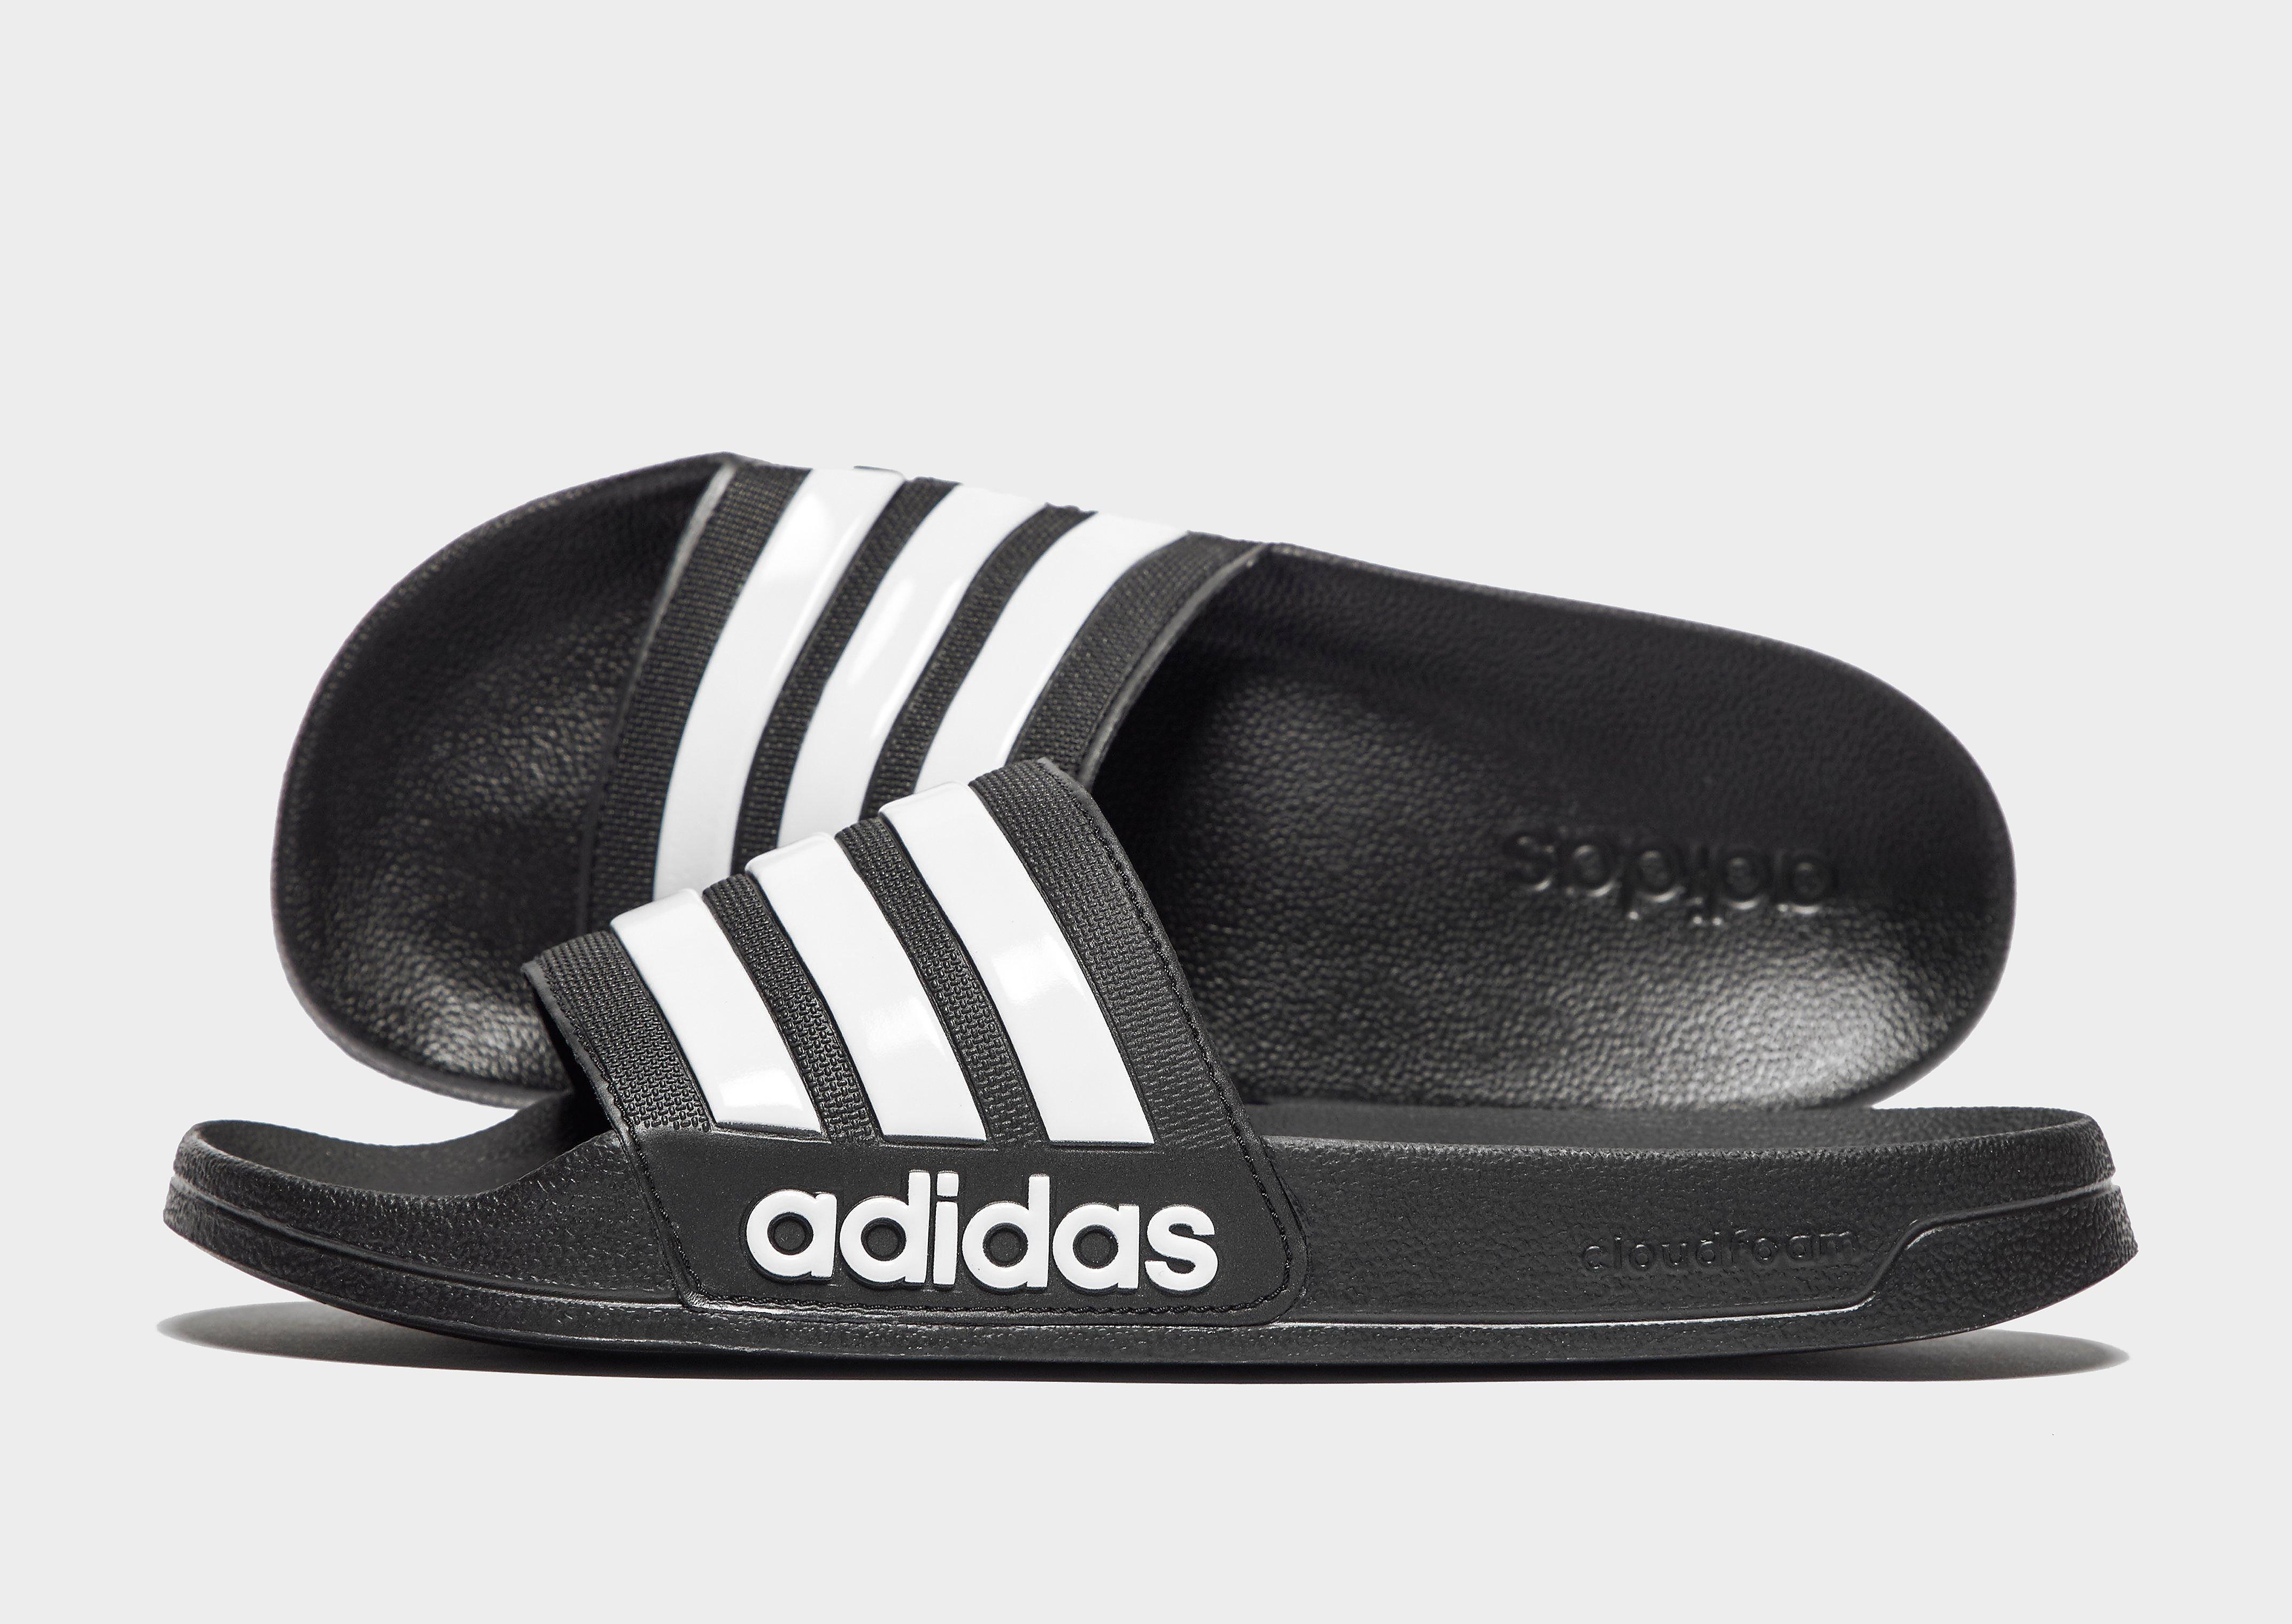 adidas Cloudfoam Adilette Slides Heren Zwart Heren